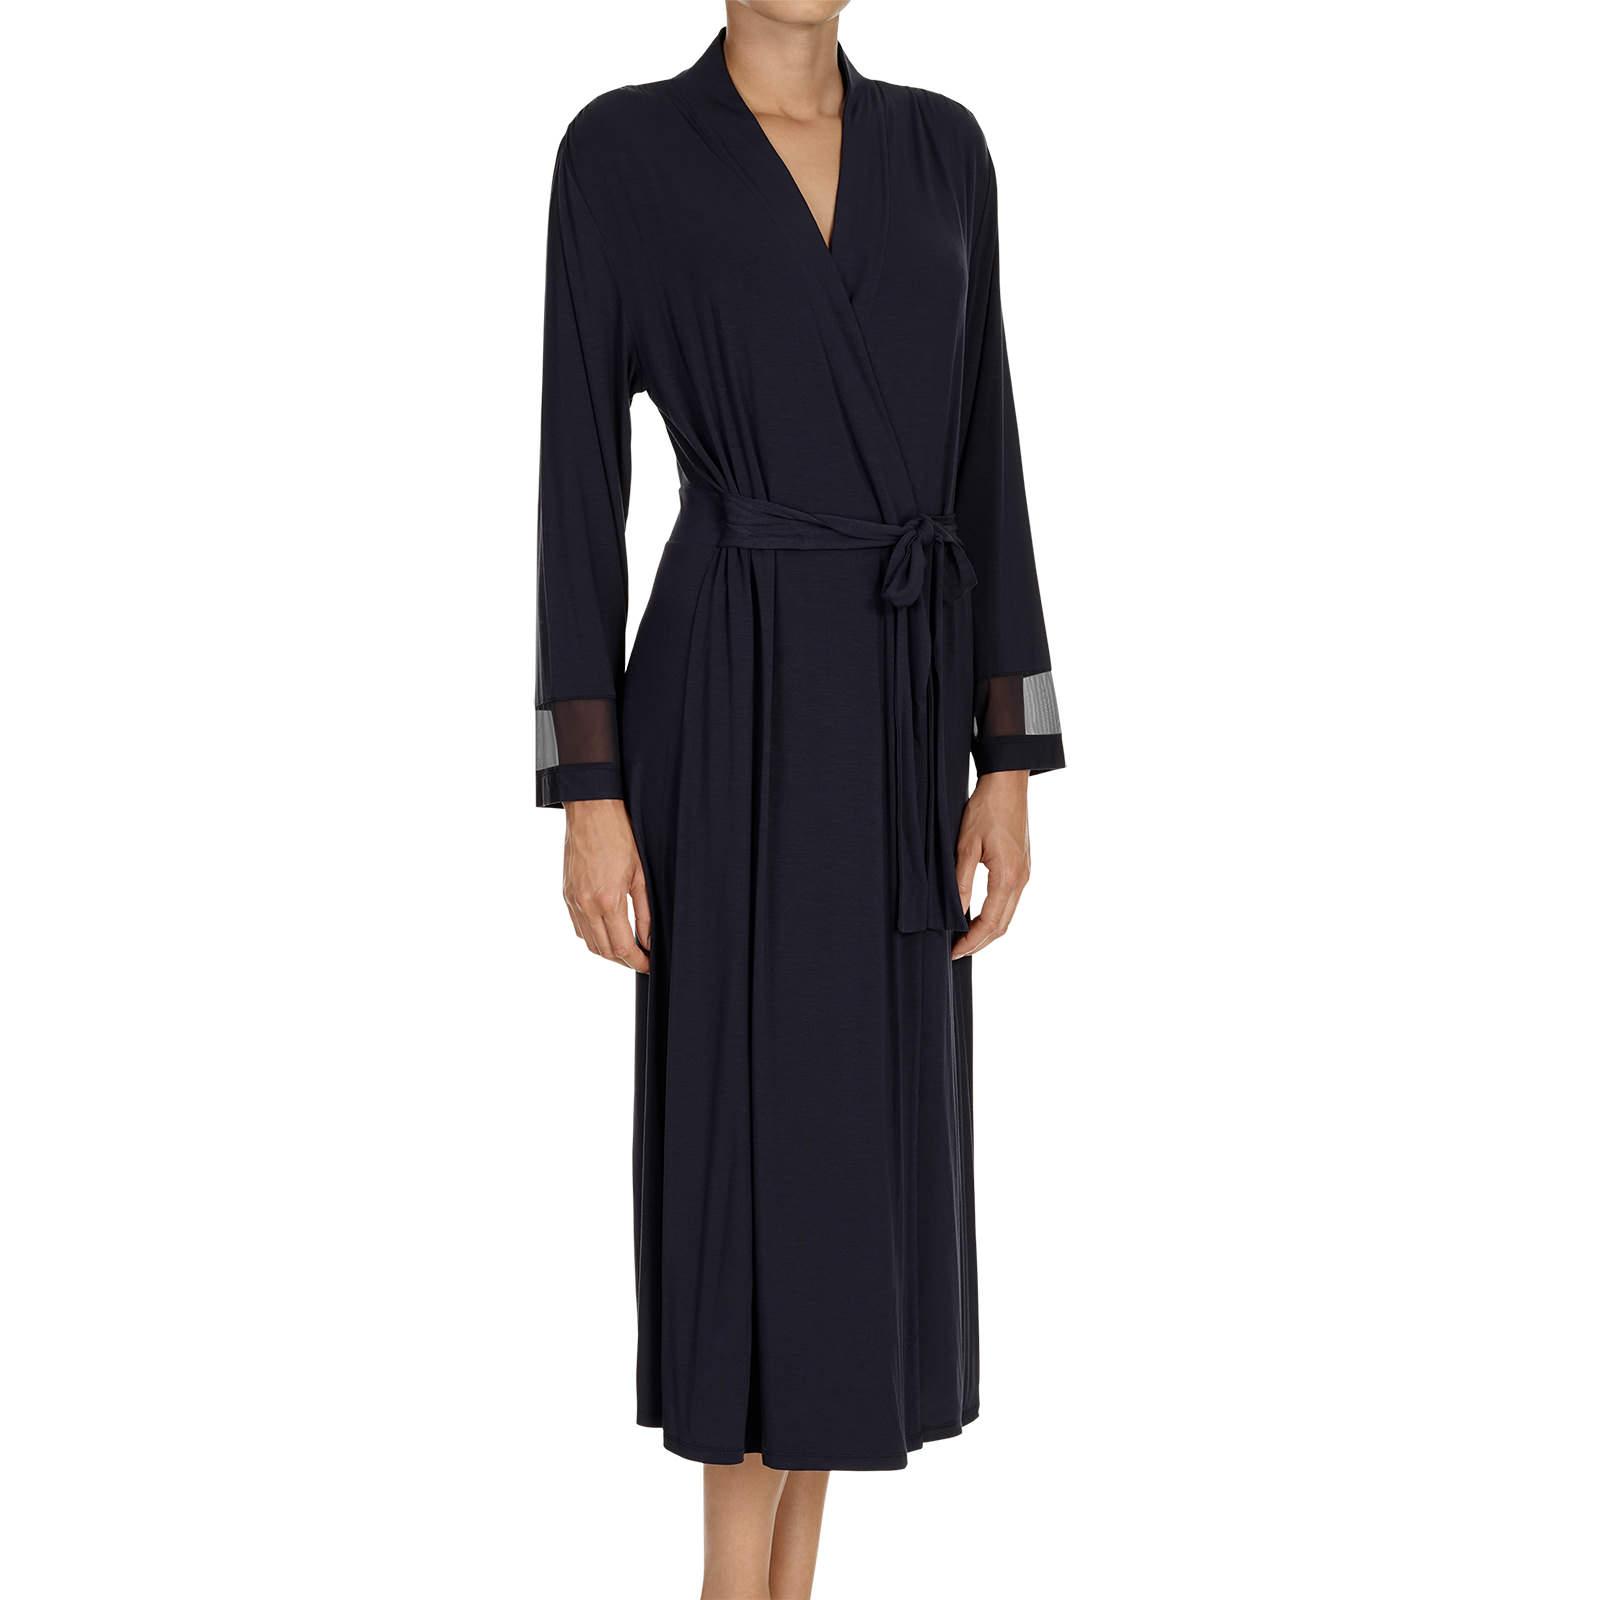 robe de chambre 171dylana187 in bleu fonc233 loungewear